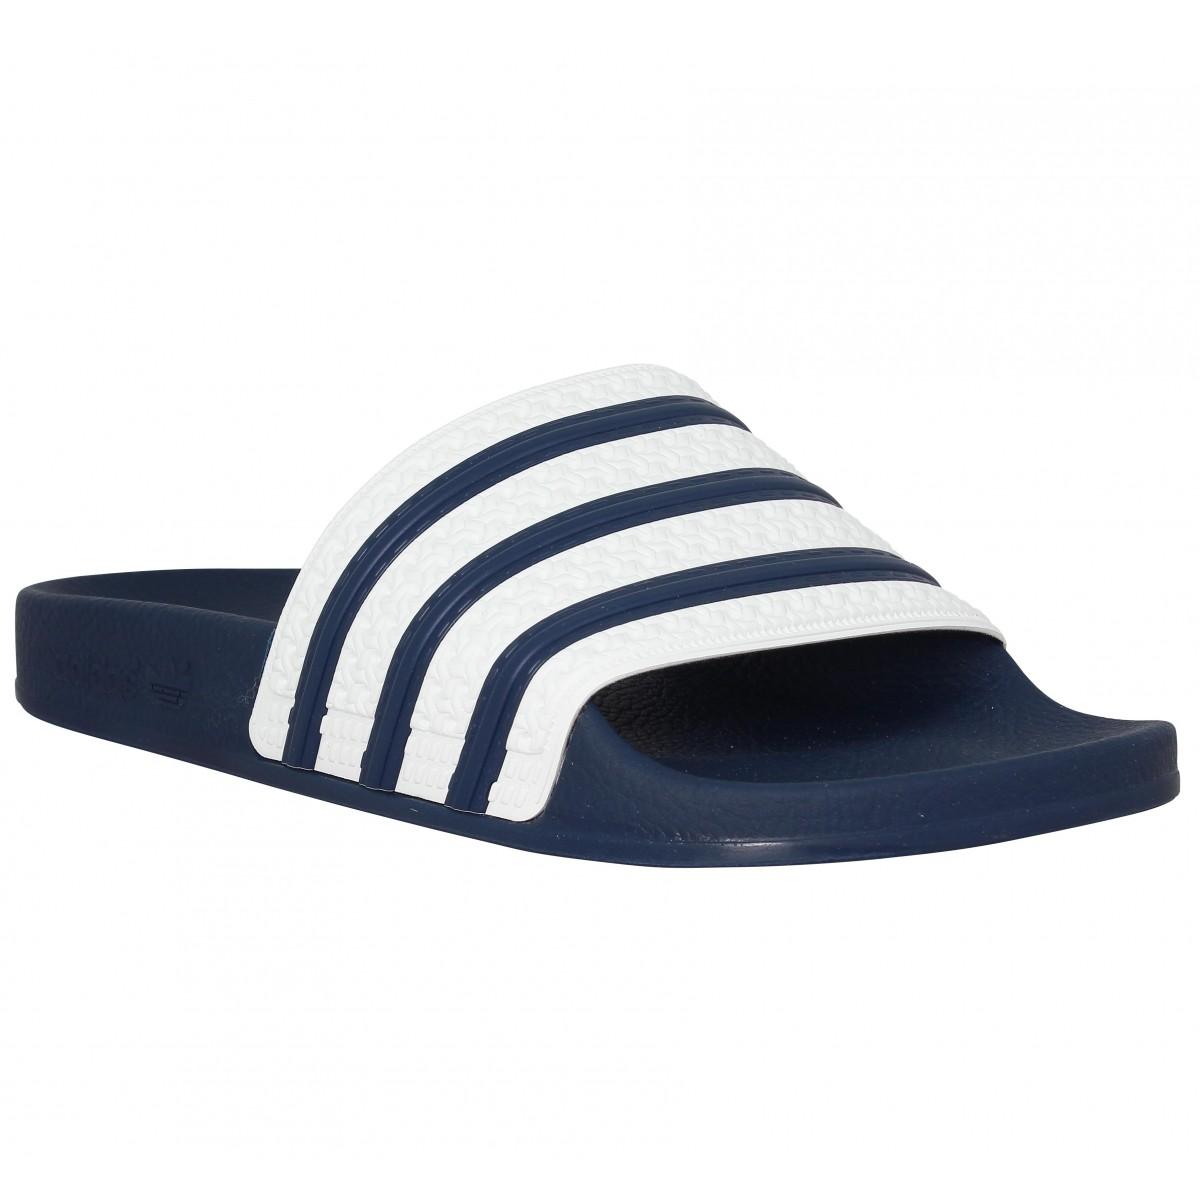 Adidas Marque Adilette Femme-39-bleu